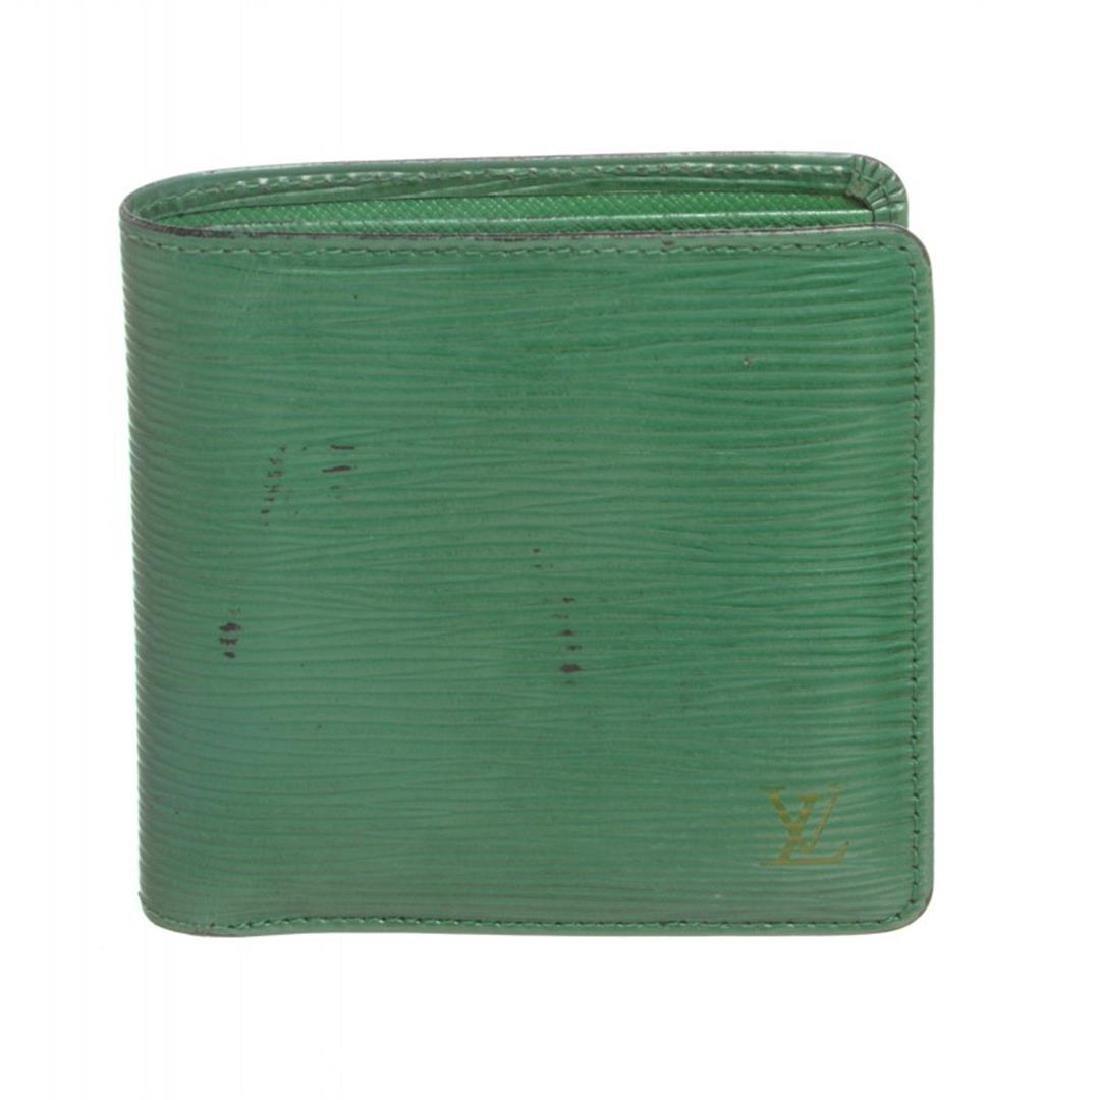 Louis Vuitton Green Epi Leather Marco Mens Wallet